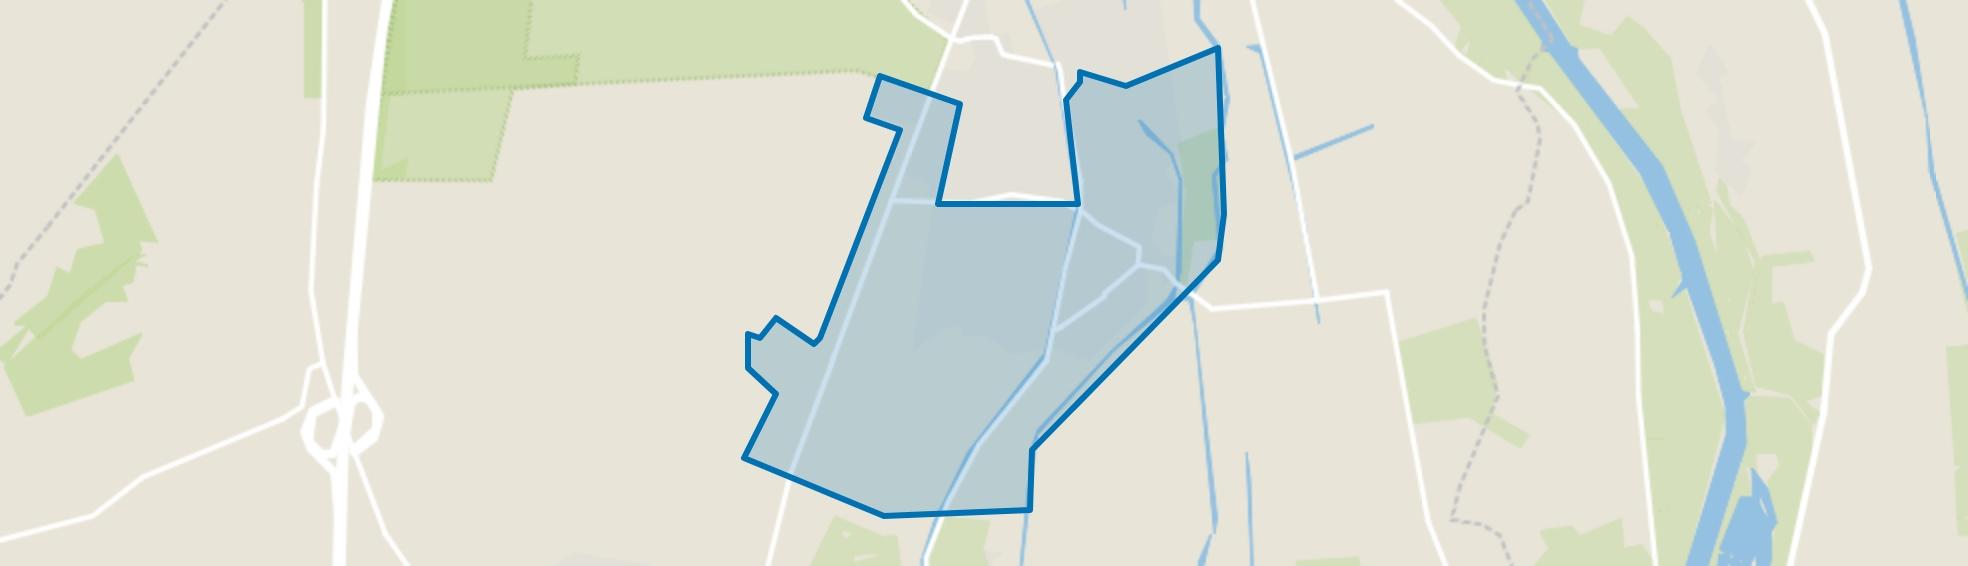 Verspreide huizen Wapenveld-Zuid, Wapenveld map